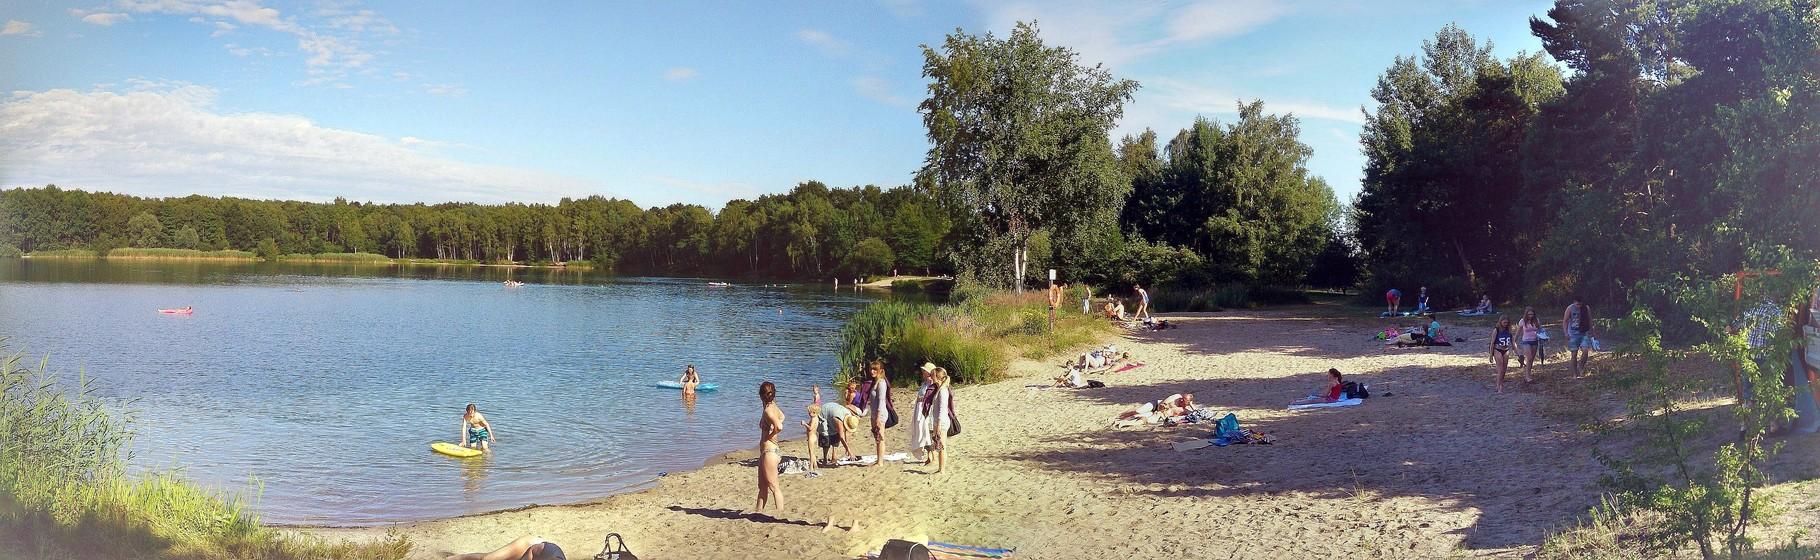 ~ Bild: Pano(d)rama Wehnser See (Strand) ~